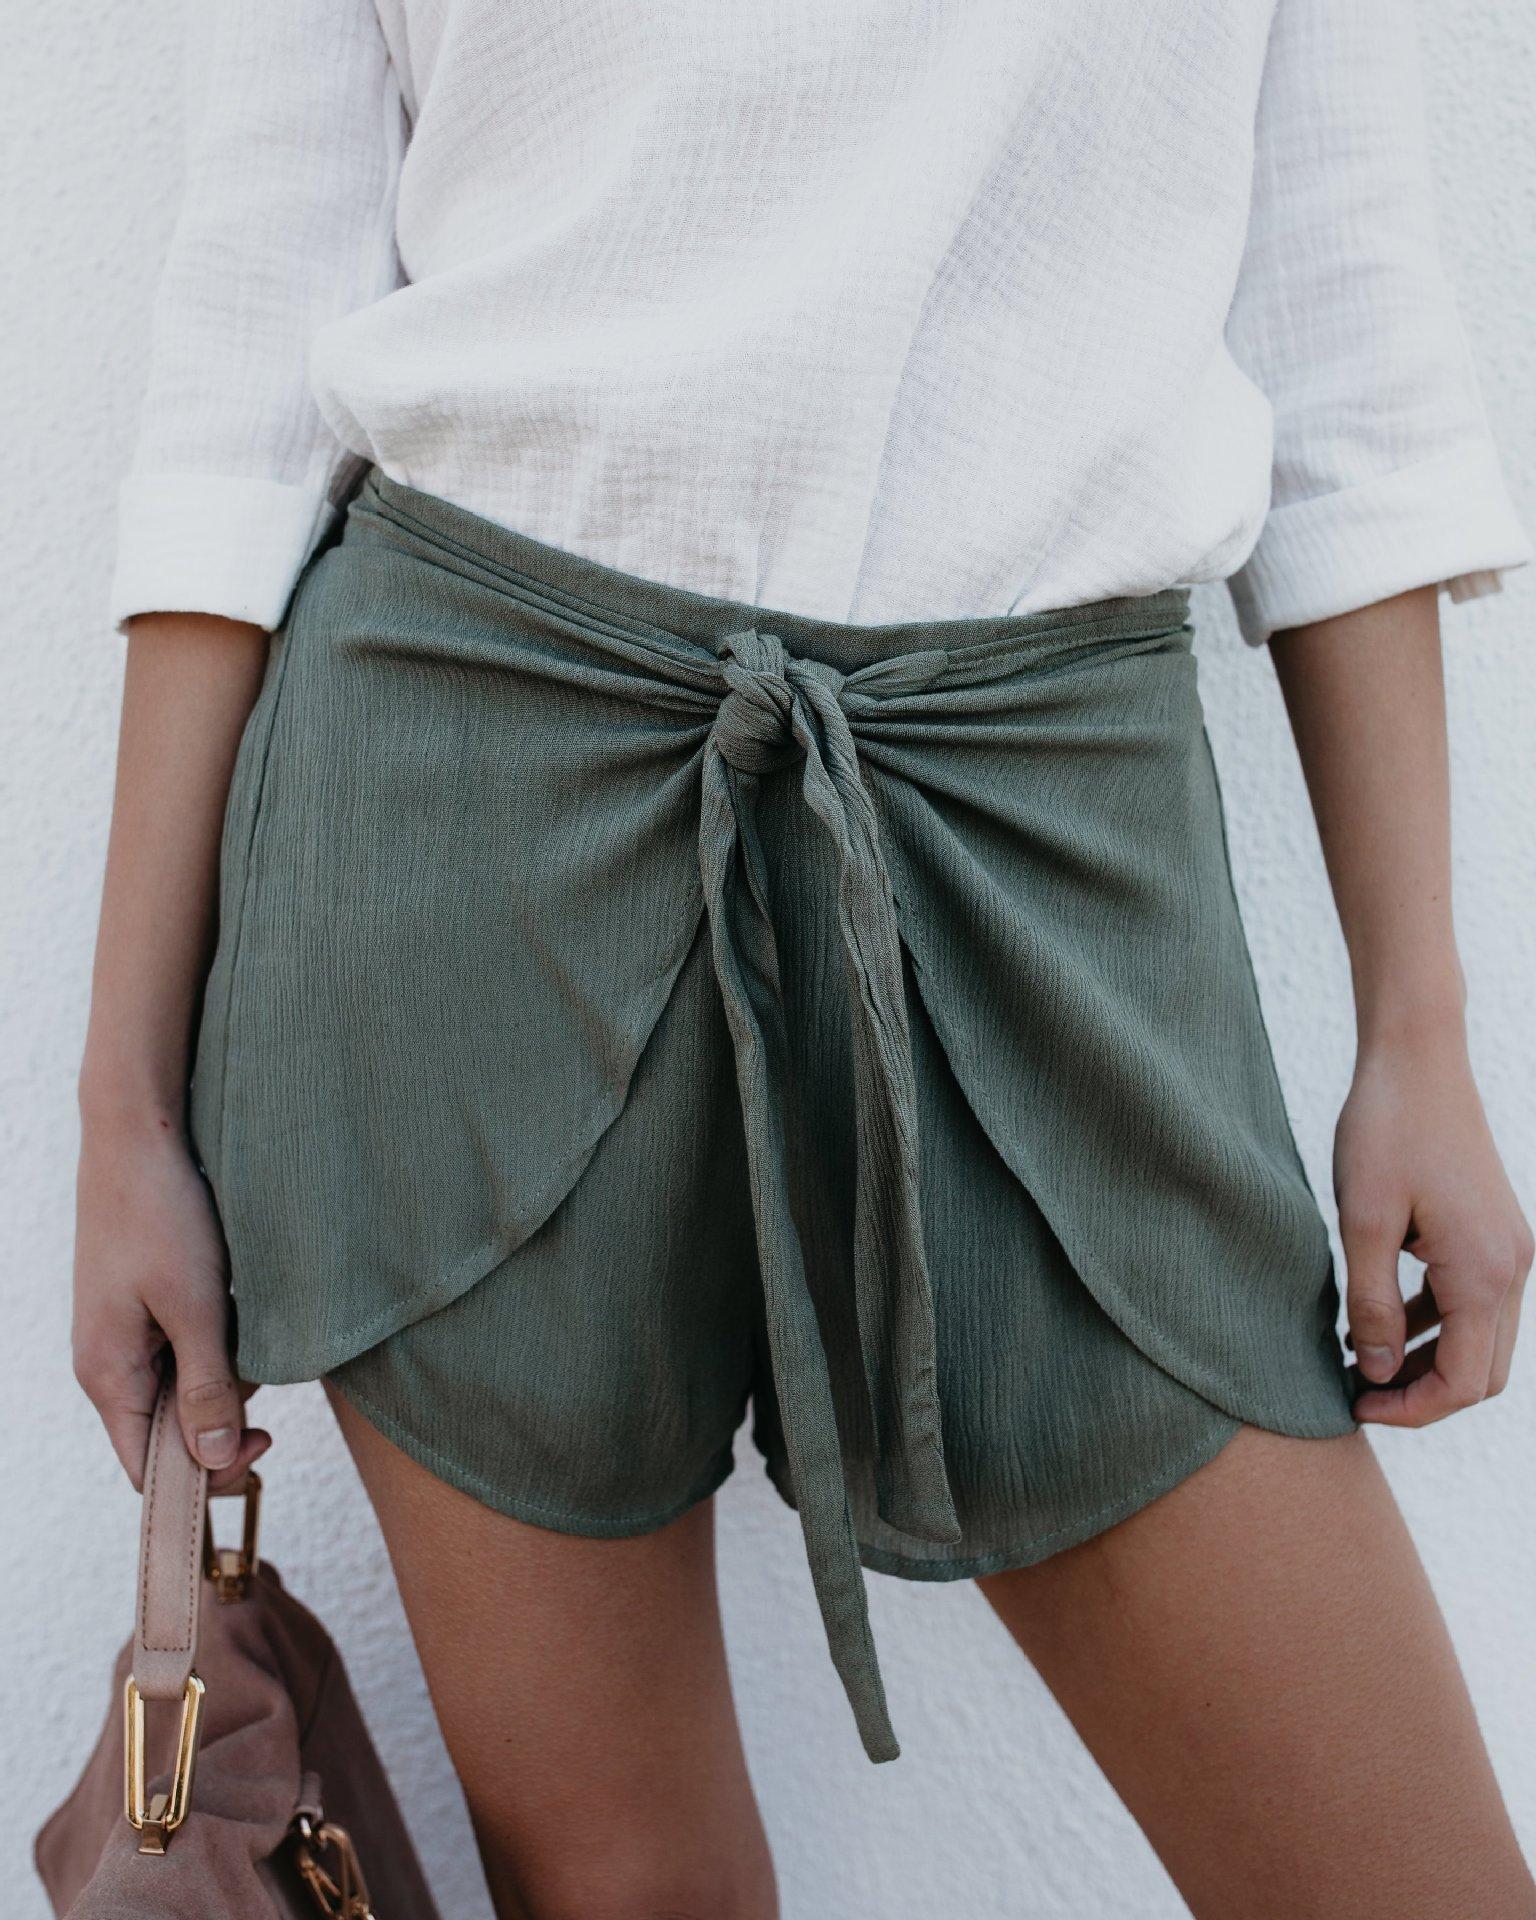 2020 Summer Stylish Fashion Mid Waist Shorts Women Ladies Casual Hot Shorts With Bow Tied Draped Elastic Waist Shorts Skirts